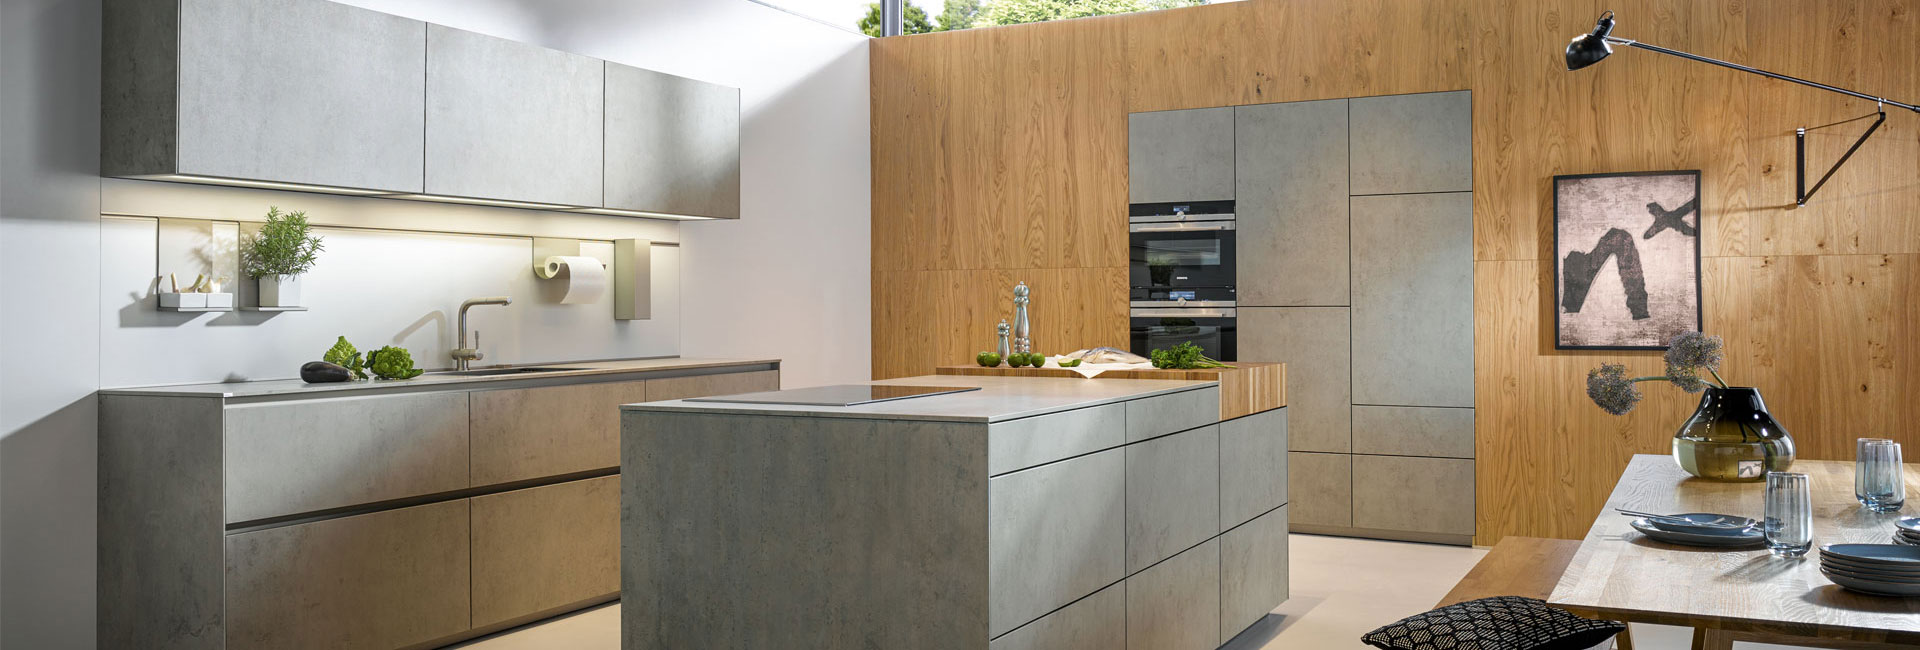 Abbildung Slide Einbauküche NX 950 Ceramic Beton Grau